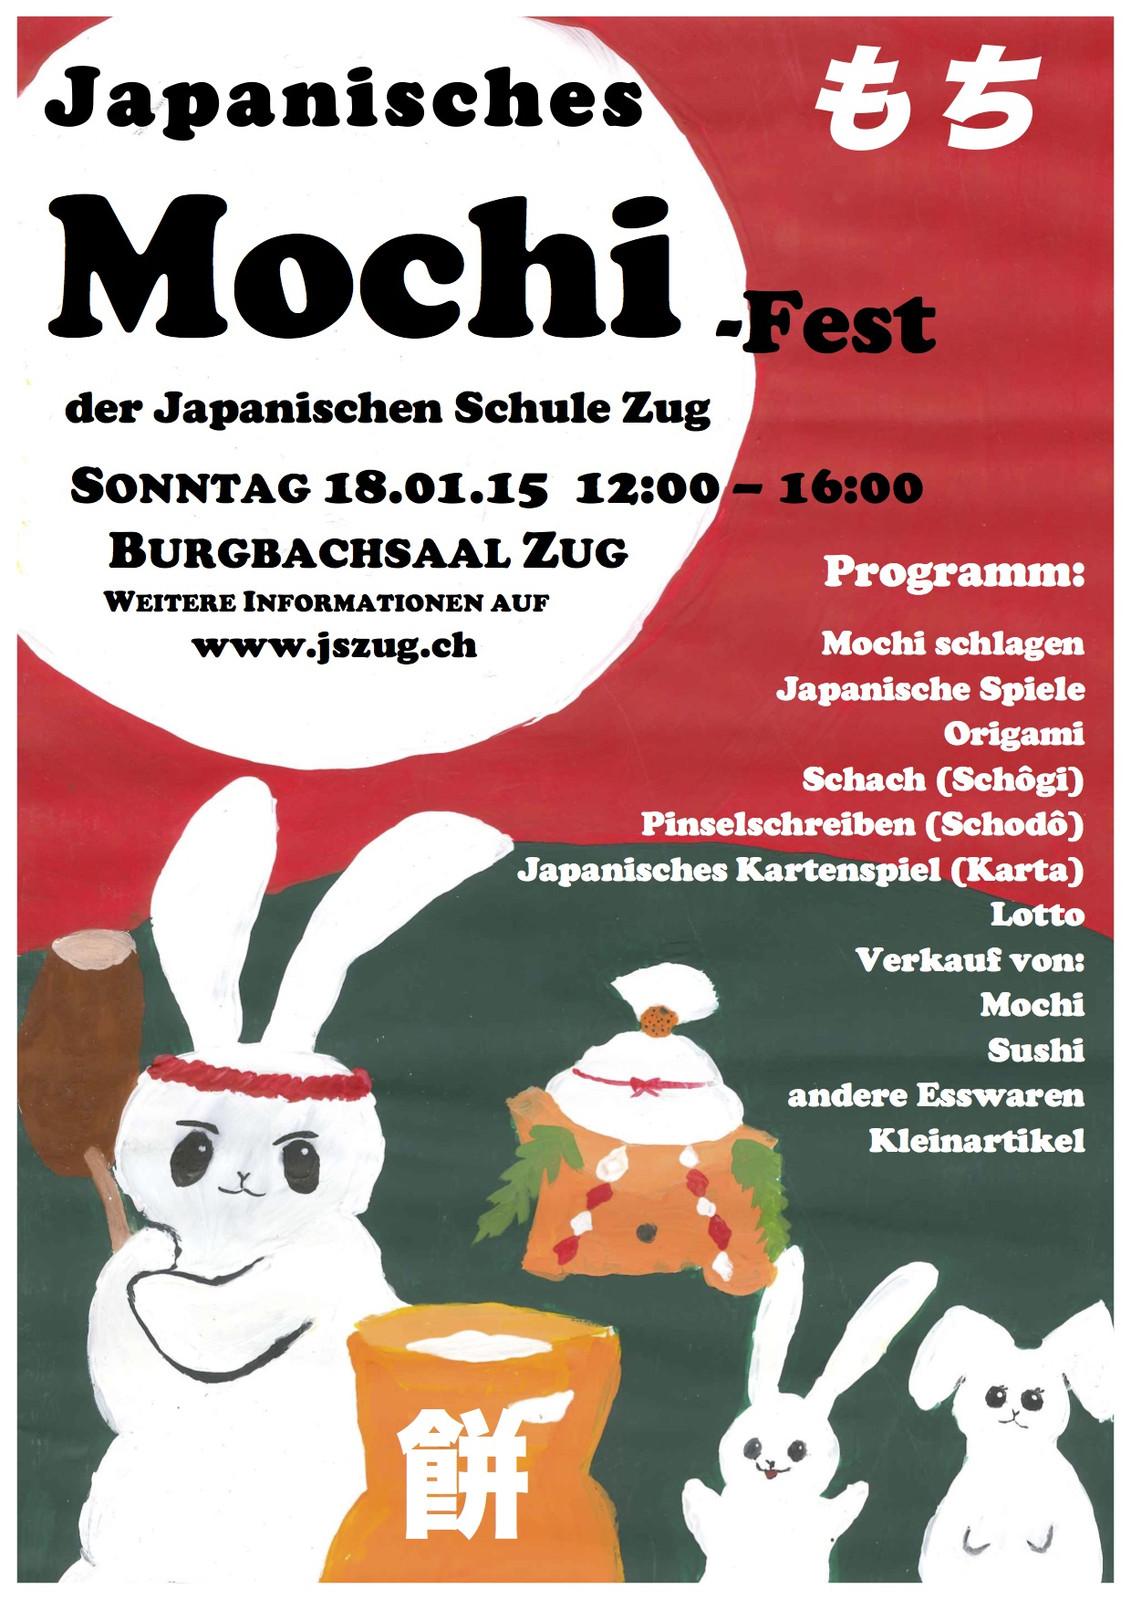 Mochifest_2014_de_2